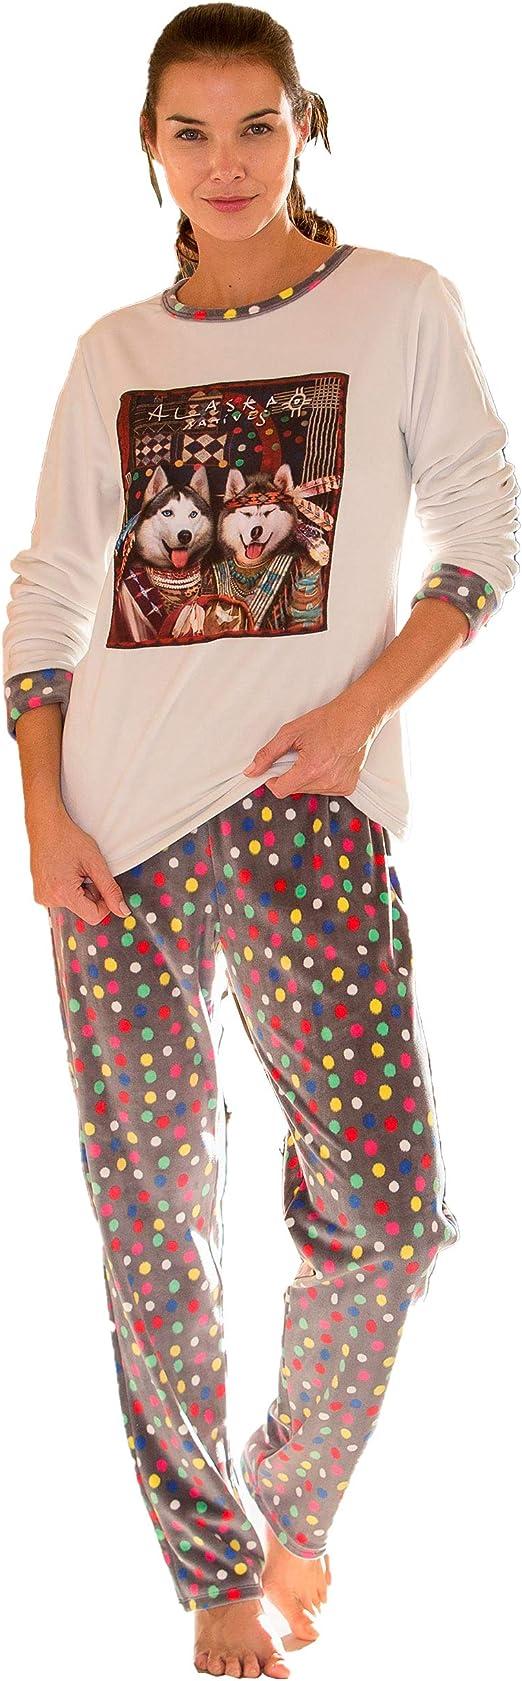 MASSANA - Pijama Mujer de Terciopelo Alaska